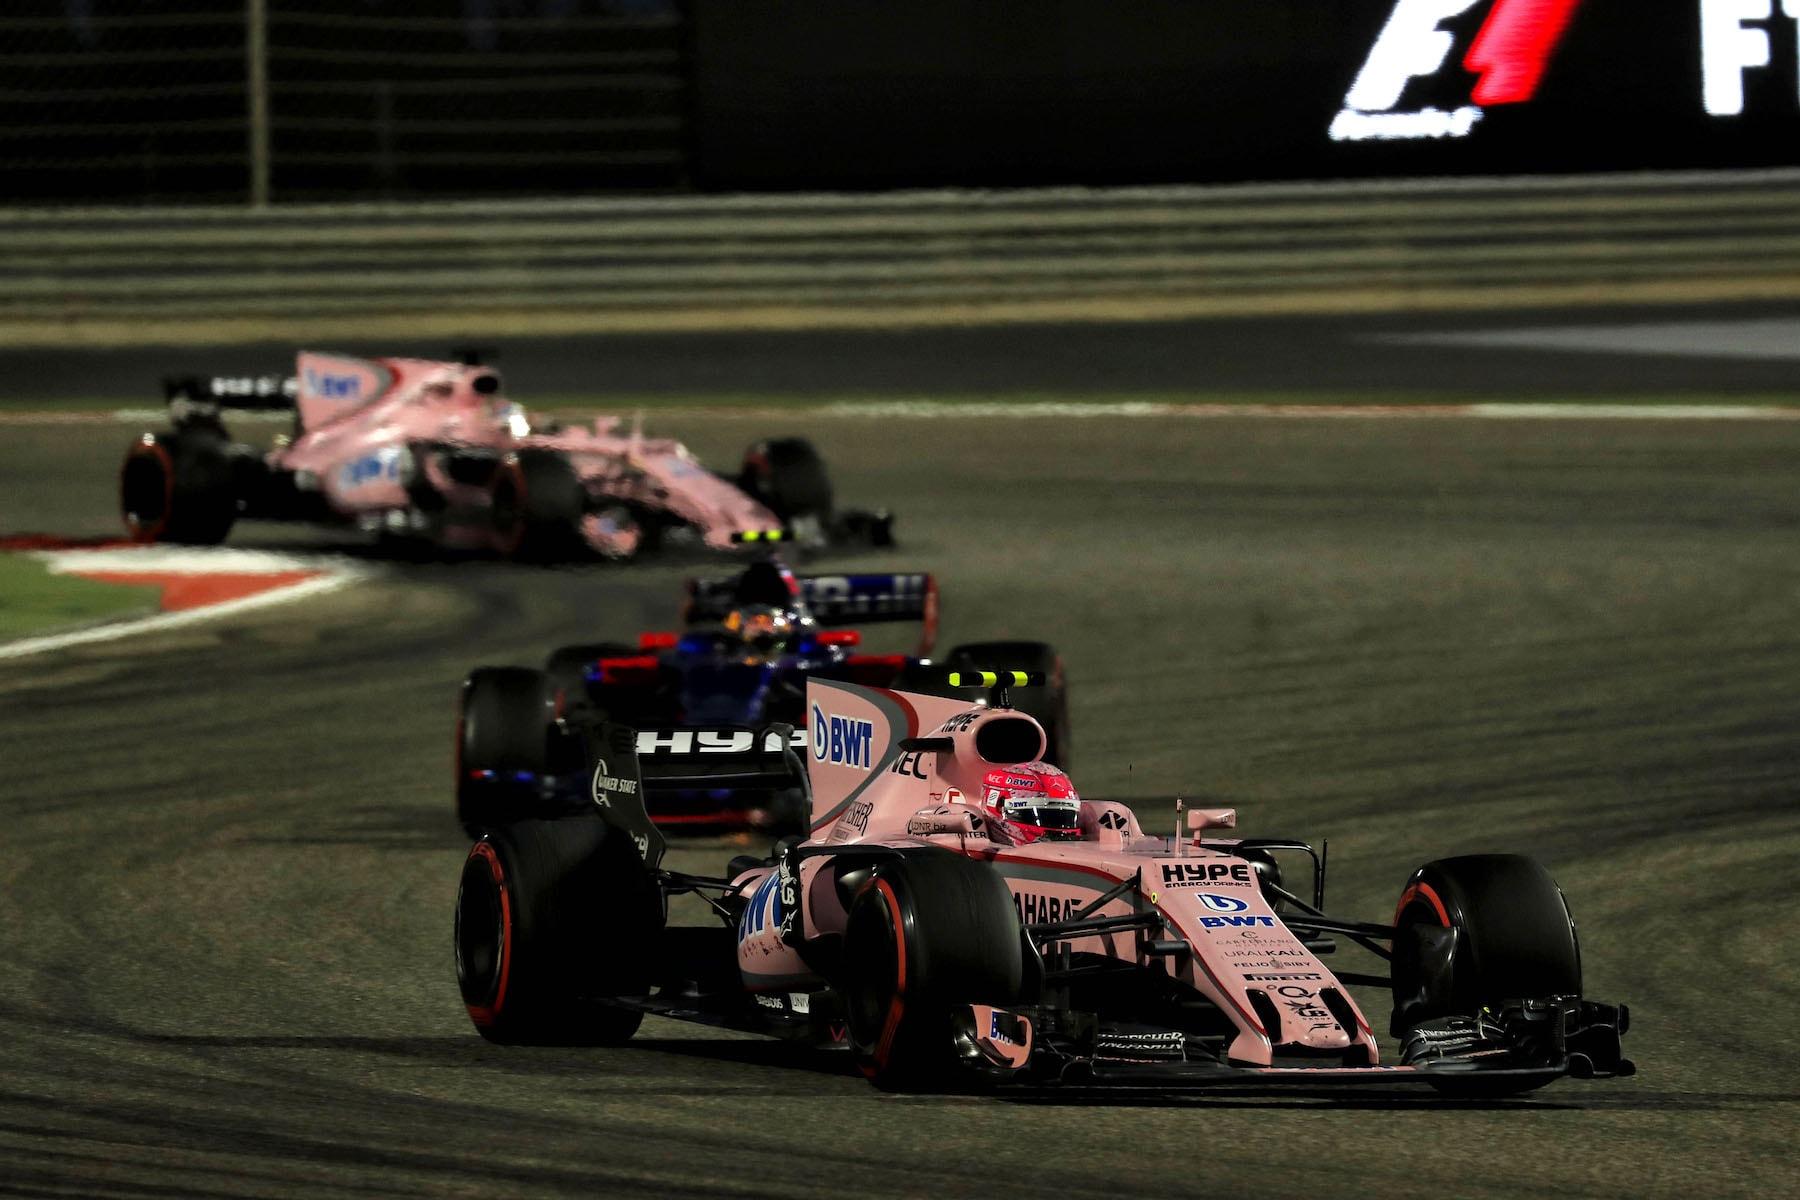 H 2017 Esteban Ocon   Force India VJM10   2017 Bahrain GP P10 1 copy.jpg